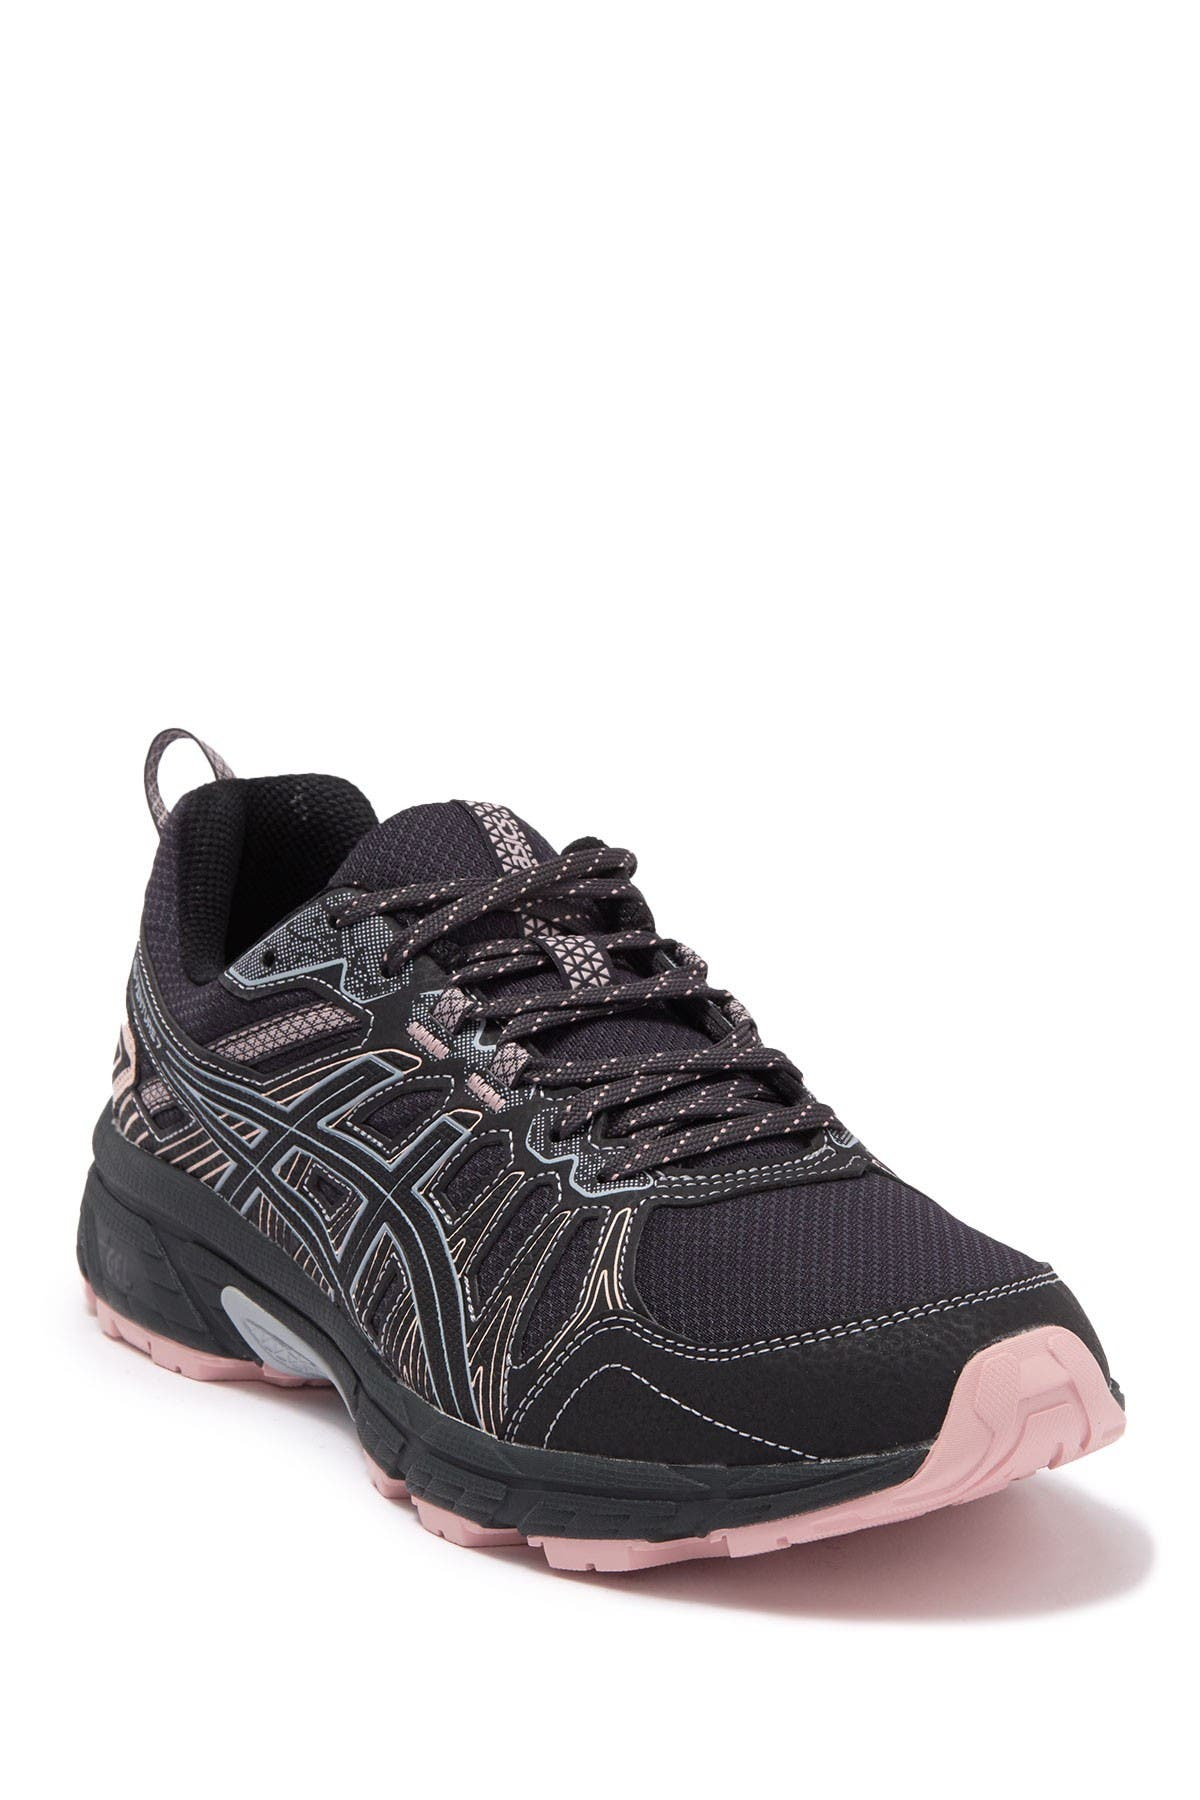 Image of ASICS Gel-Venture 7 Sneaker